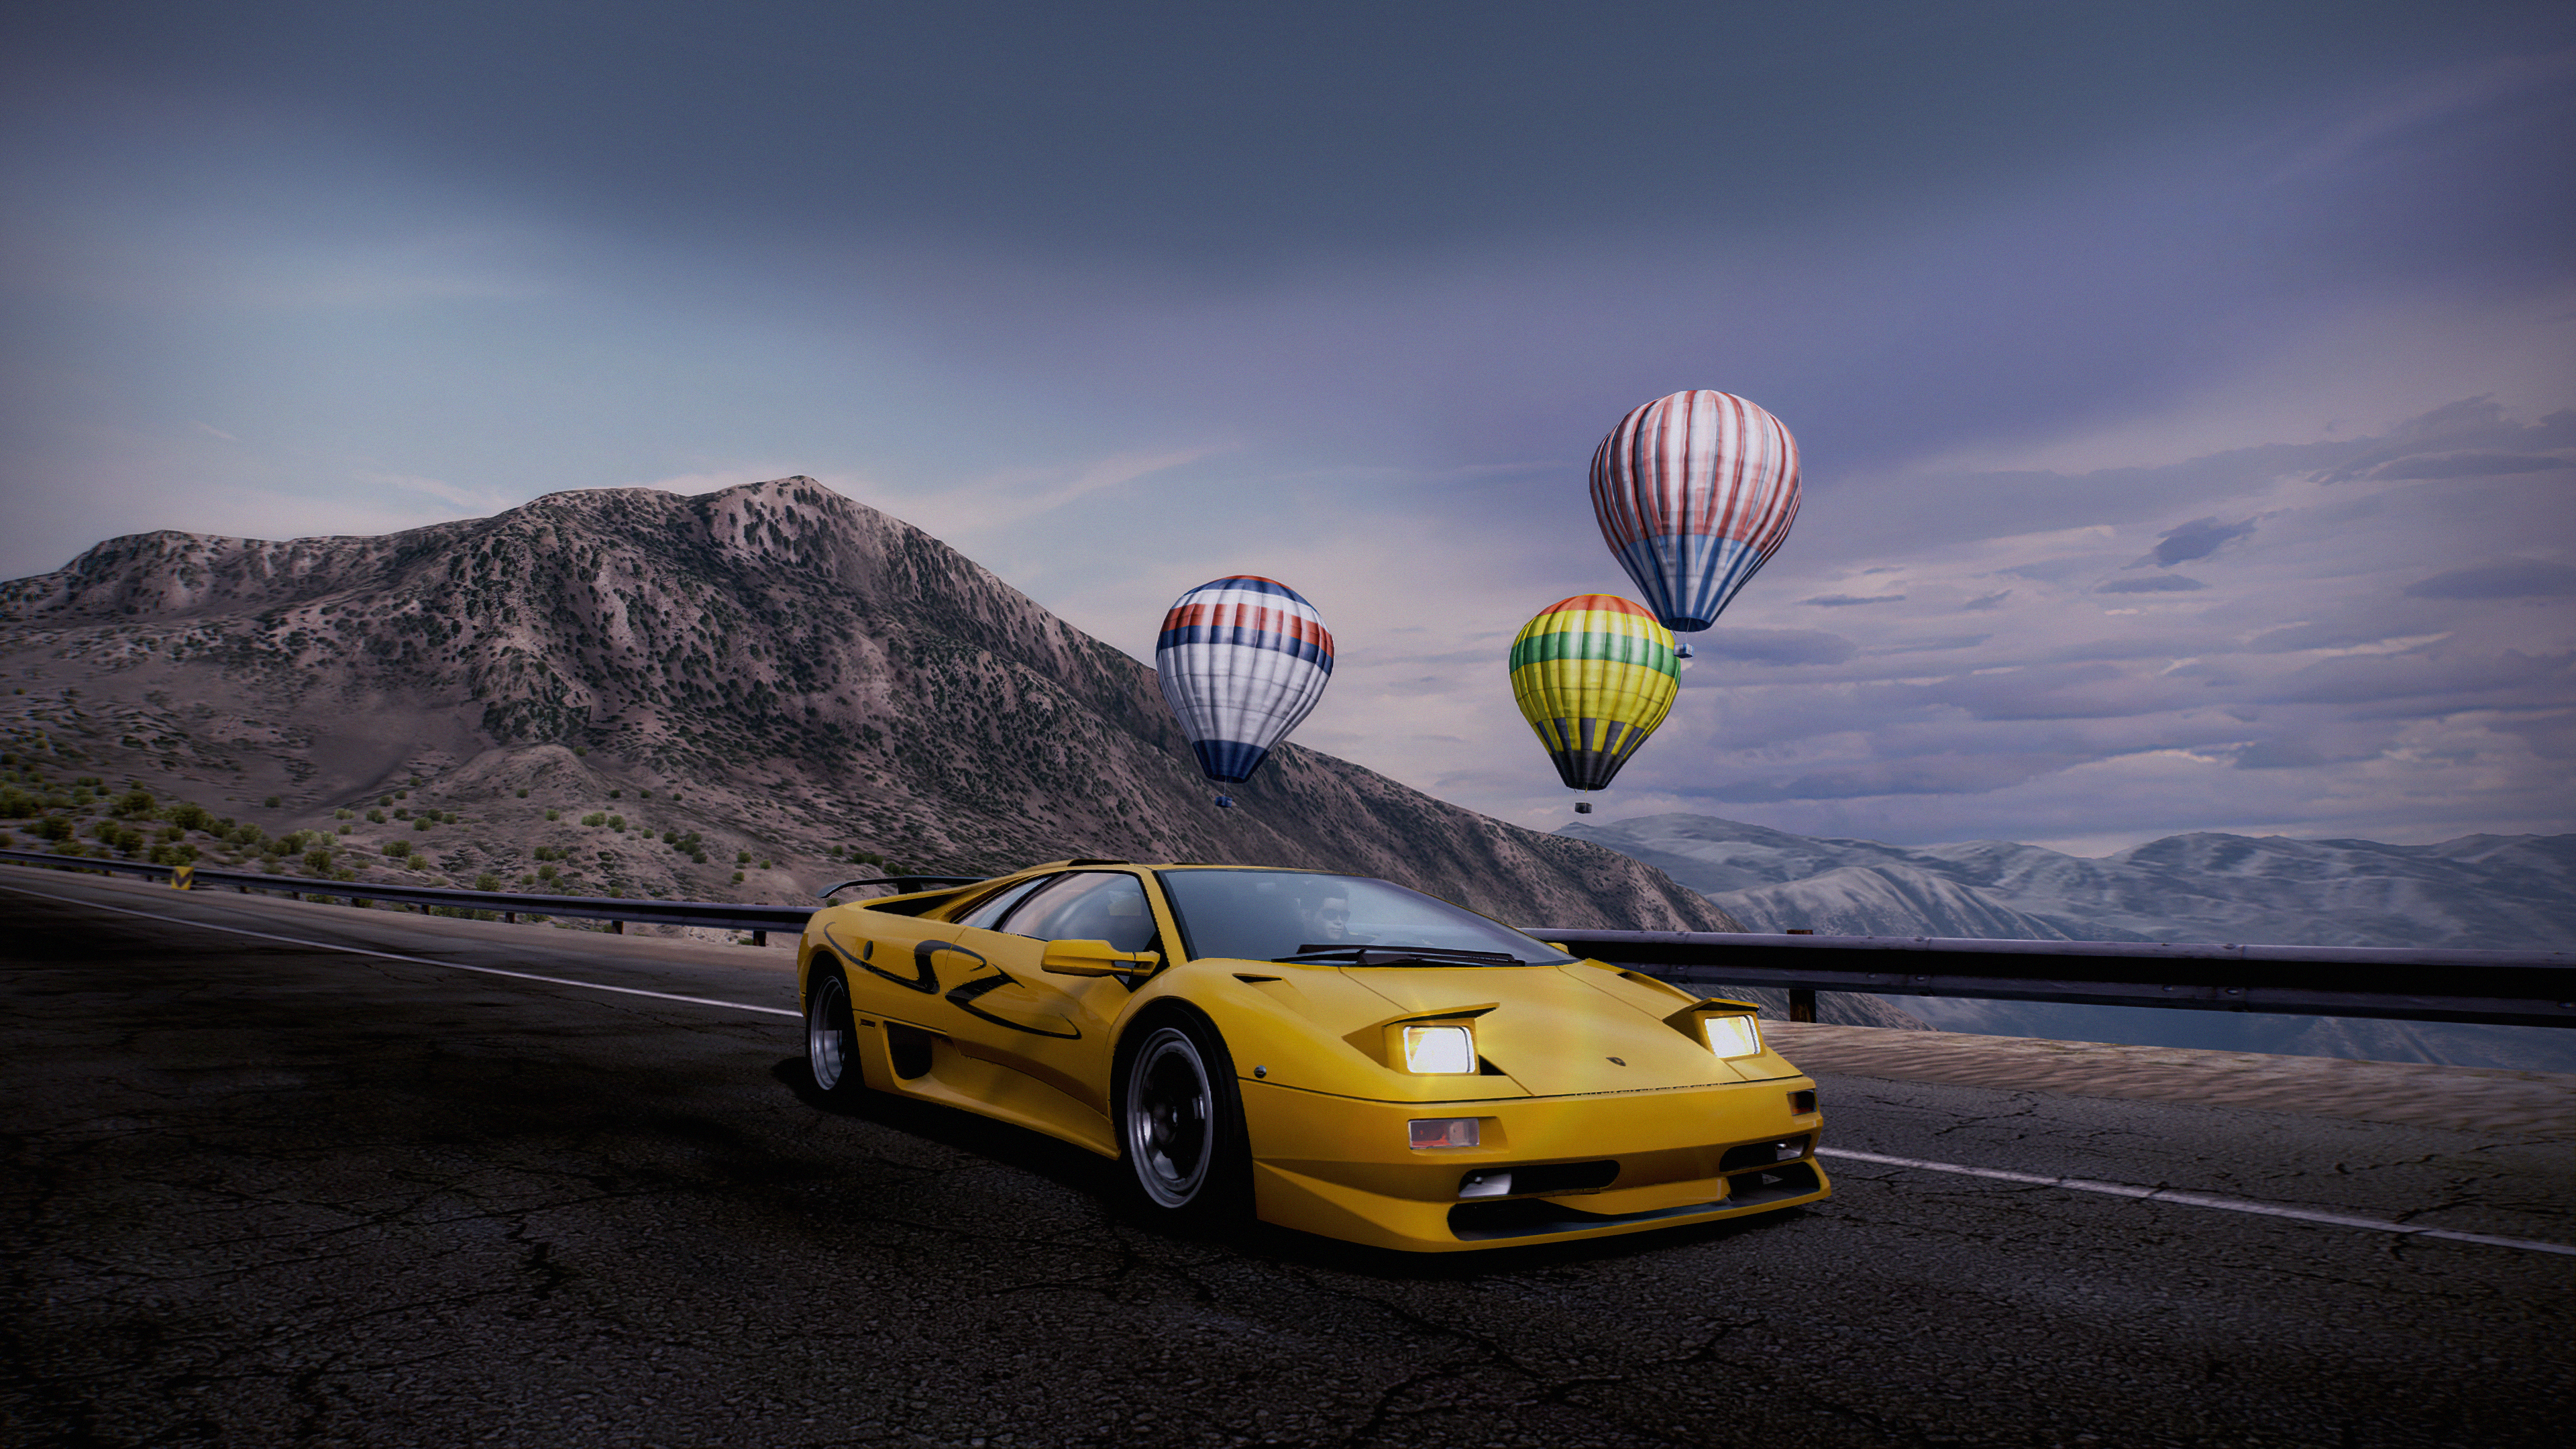 Fondos de pantalla Need for Speed Hot pursuit Lamborghini Diablo